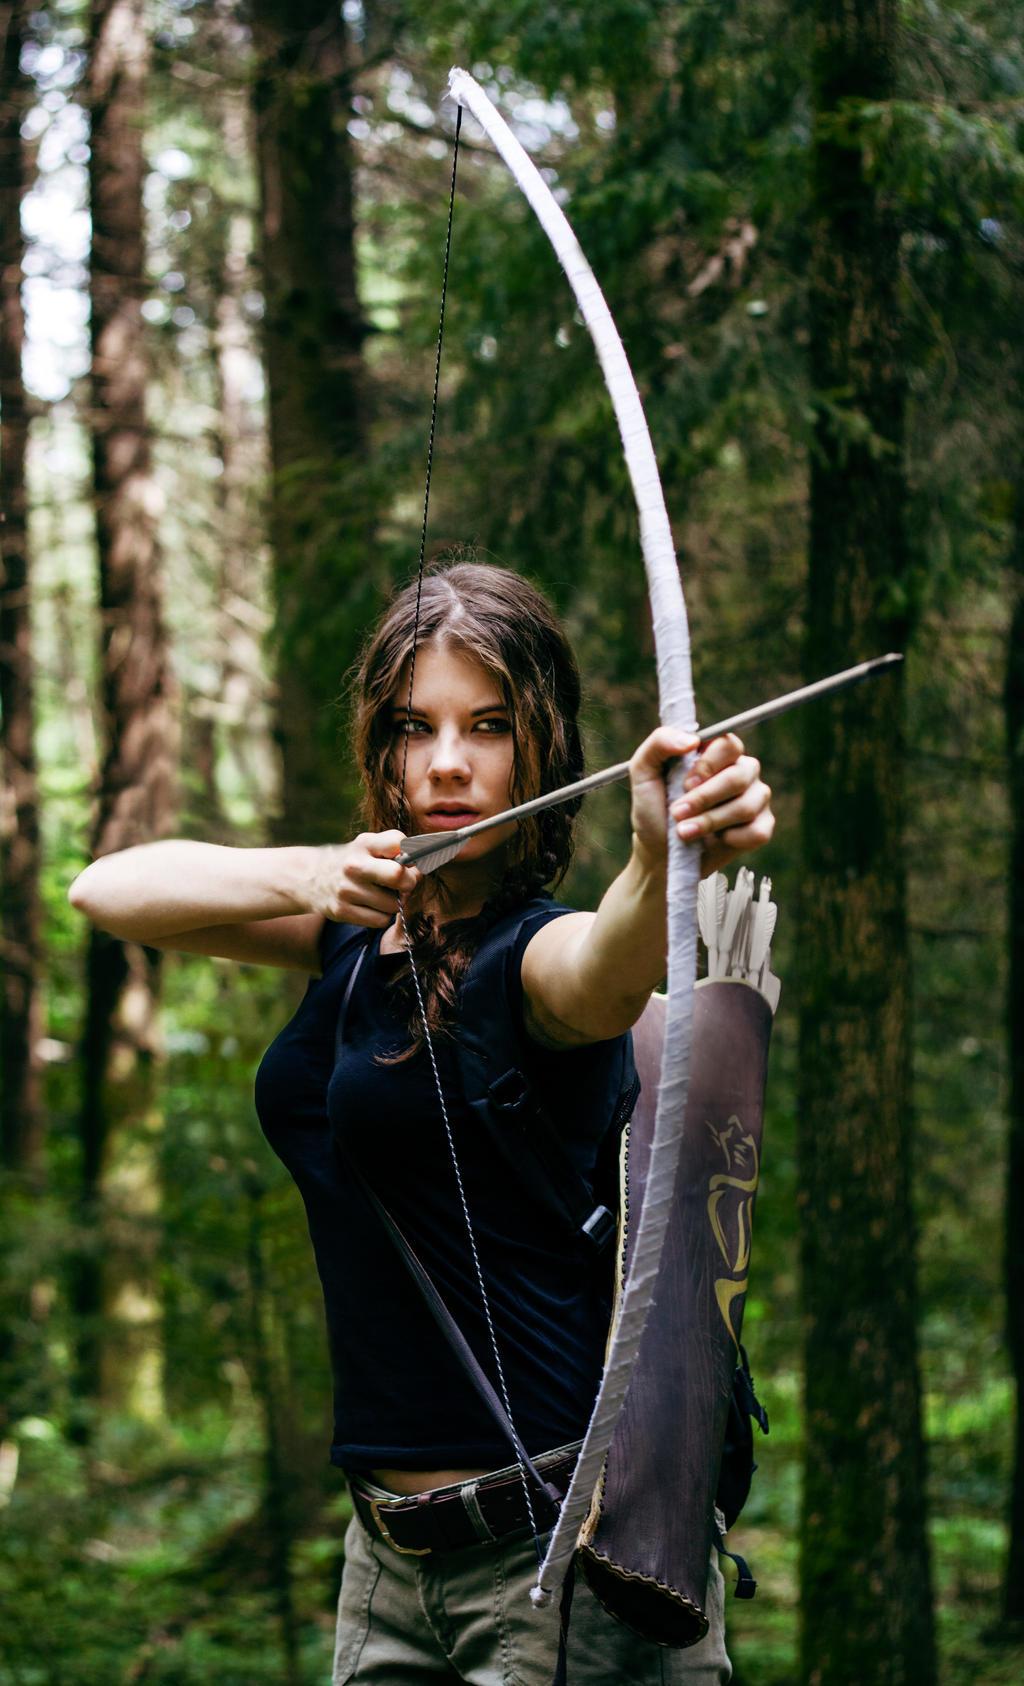 Hunger Games-Katniss Everdeen by Anastasya01